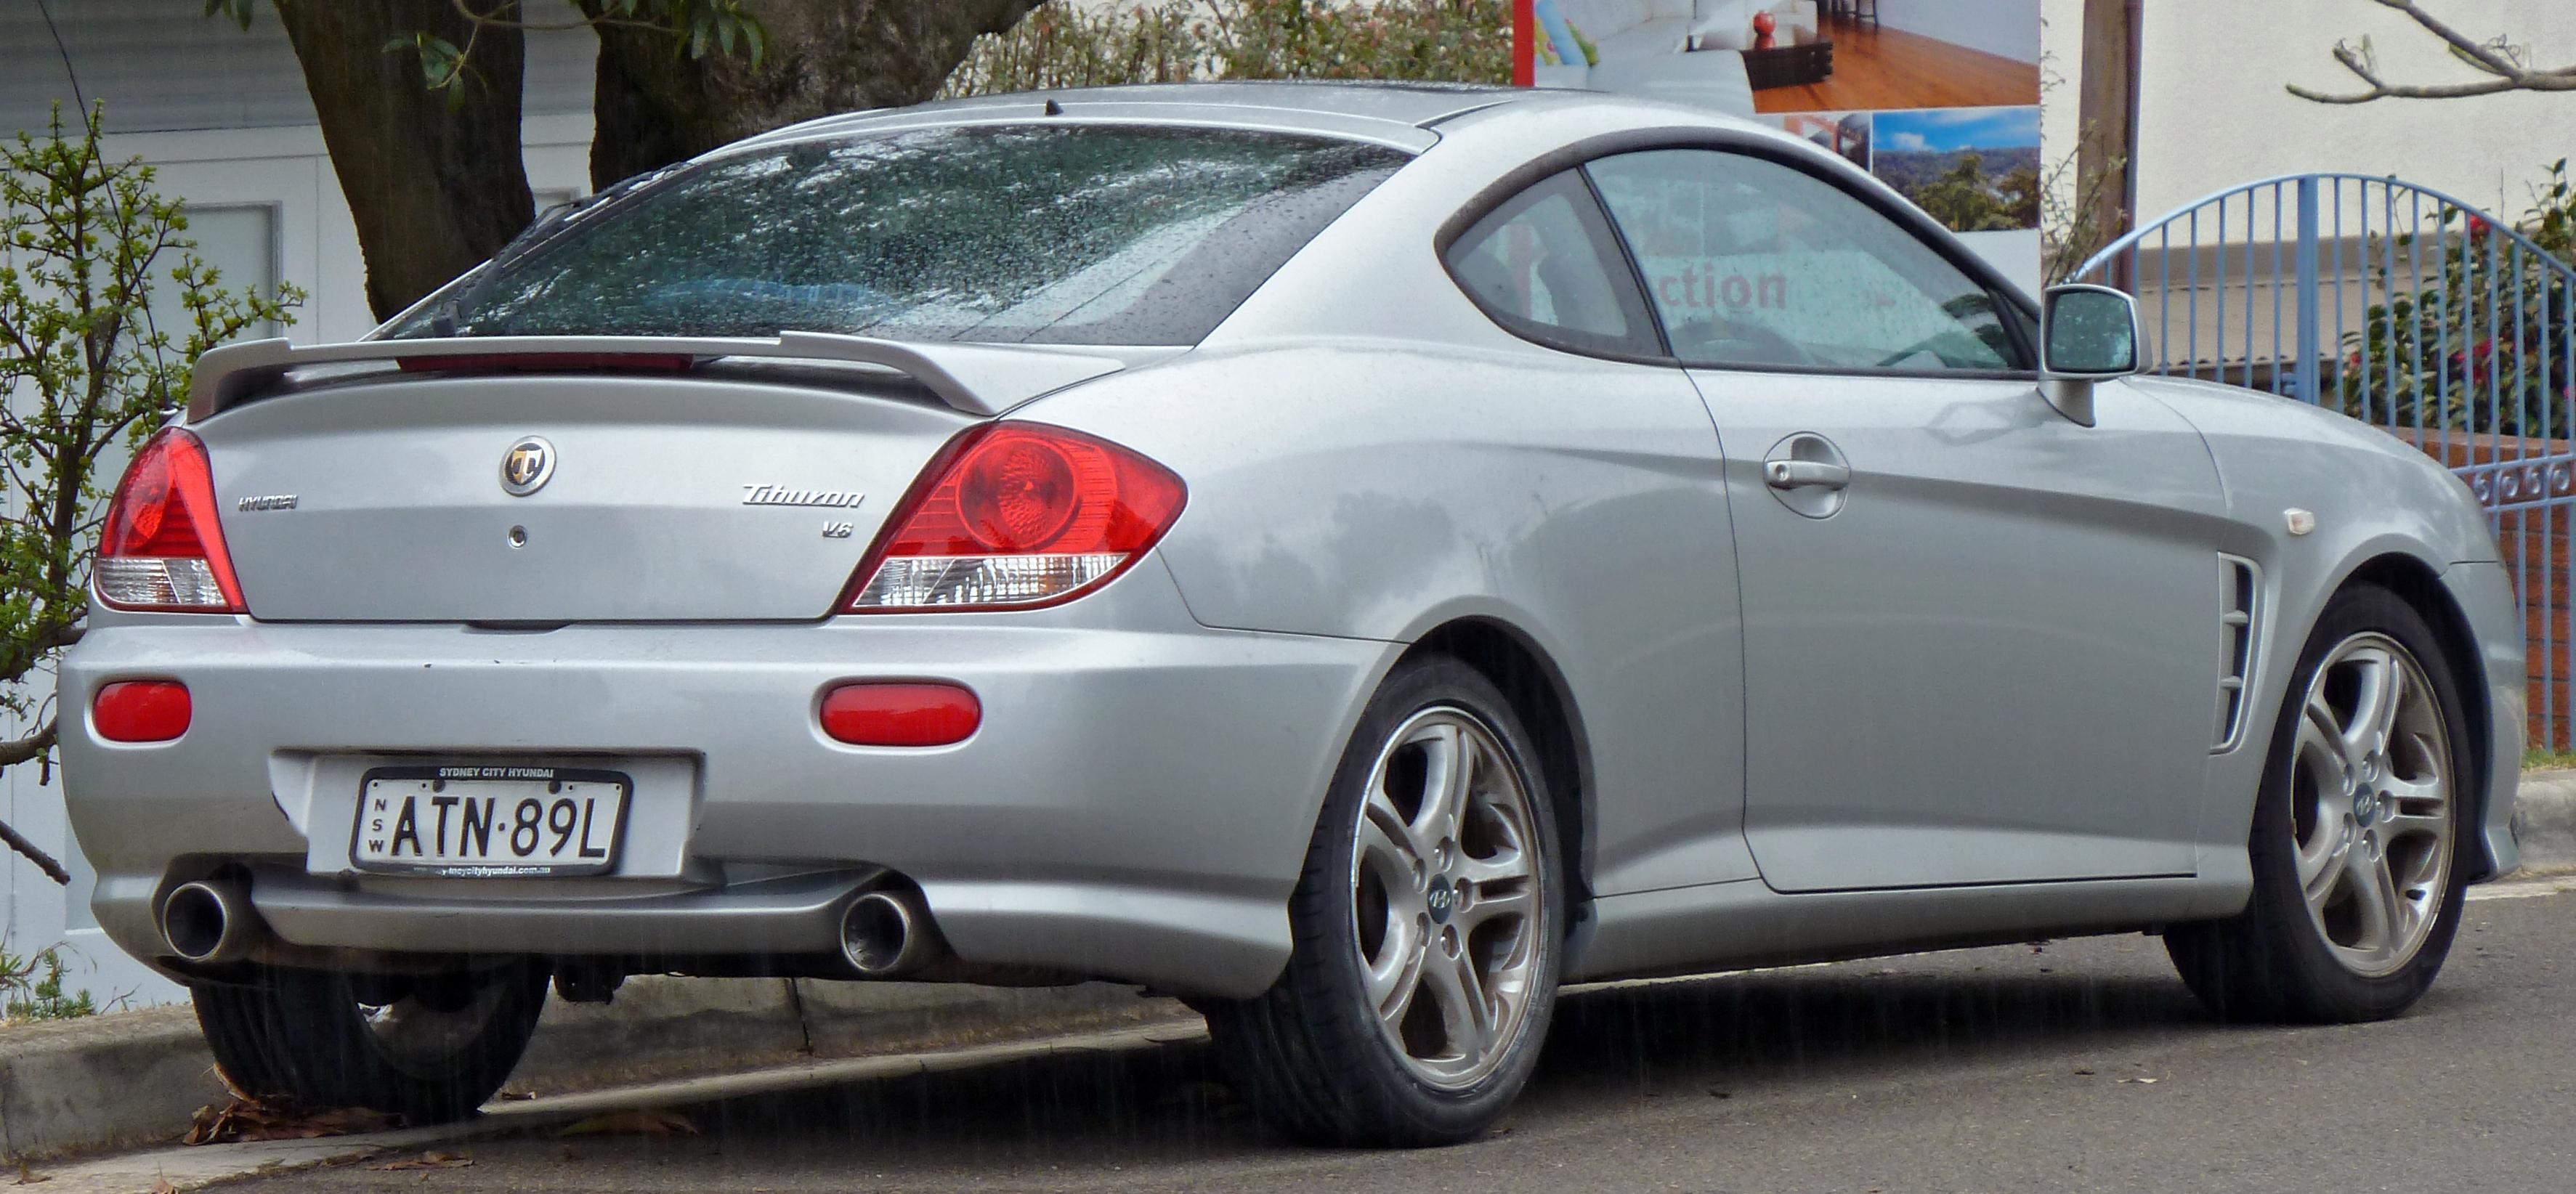 Hyundai Tiburon II (GK) Restyling 2007 - 2009 Coupe #5